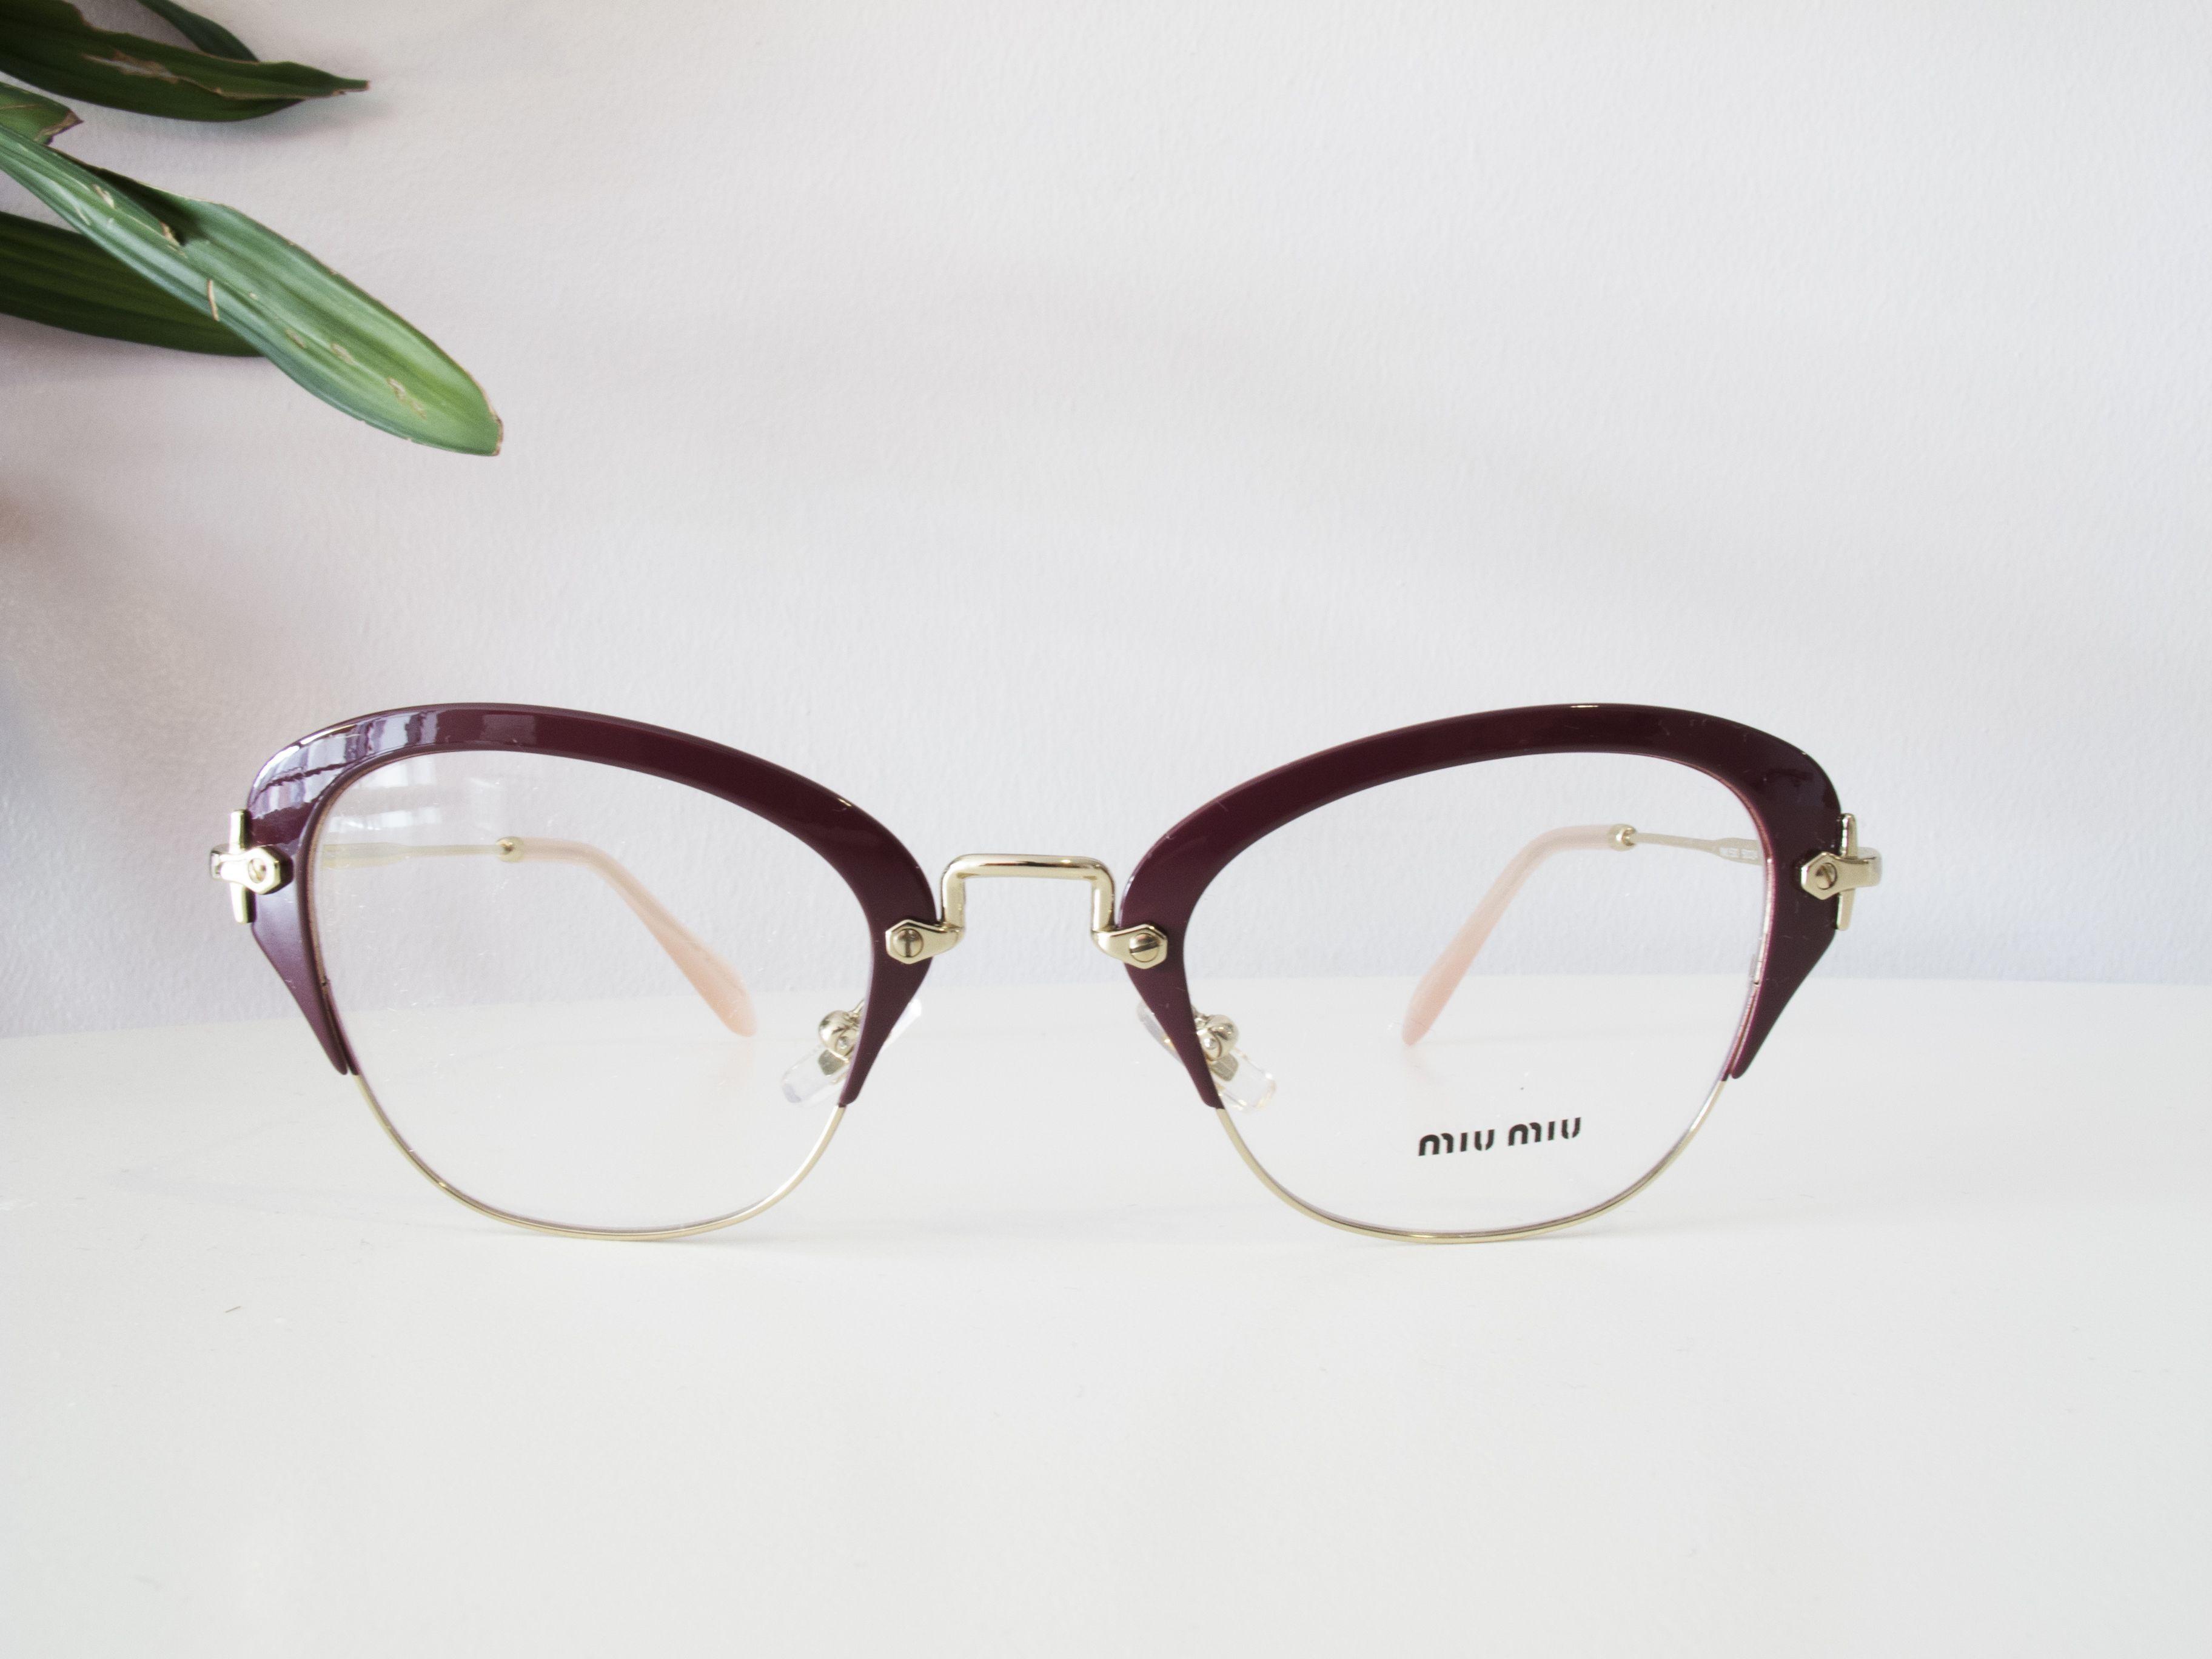 4cb9d0c0da66 Beautiful Miu Miu Glasses in Amaranth. Miu Miu is the little trendy sister  brand of Prada. Here at Red Hot Sunglasses we stock designer sunglasses and  ...